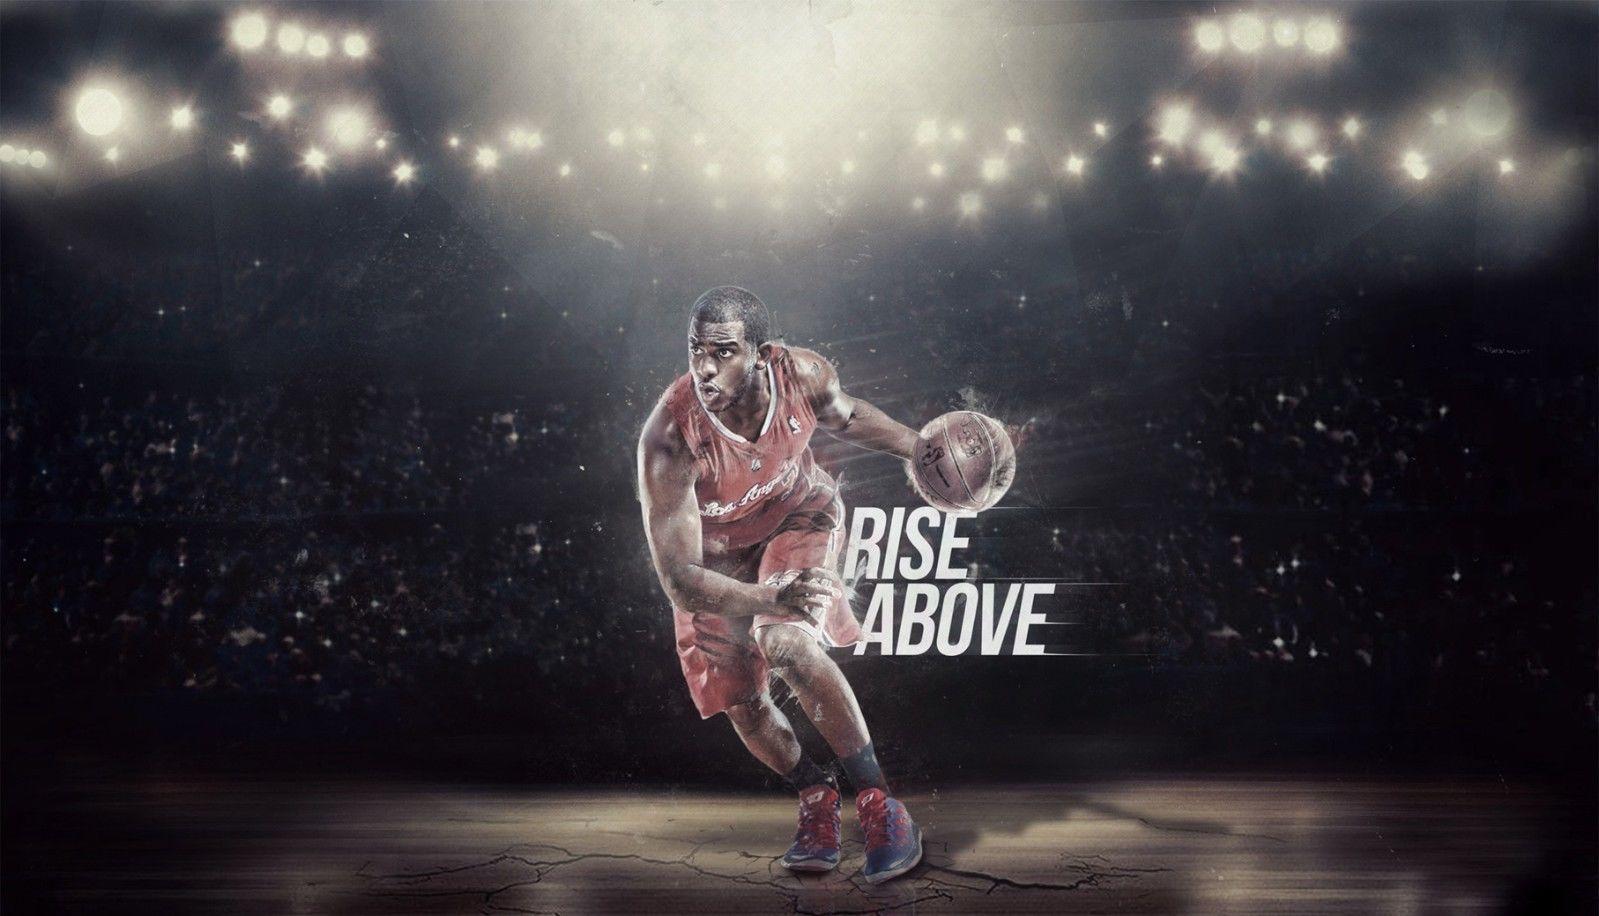 Chris-Paul-Basketball-Star-Fabric-poster-wallpaper-wpc9203560